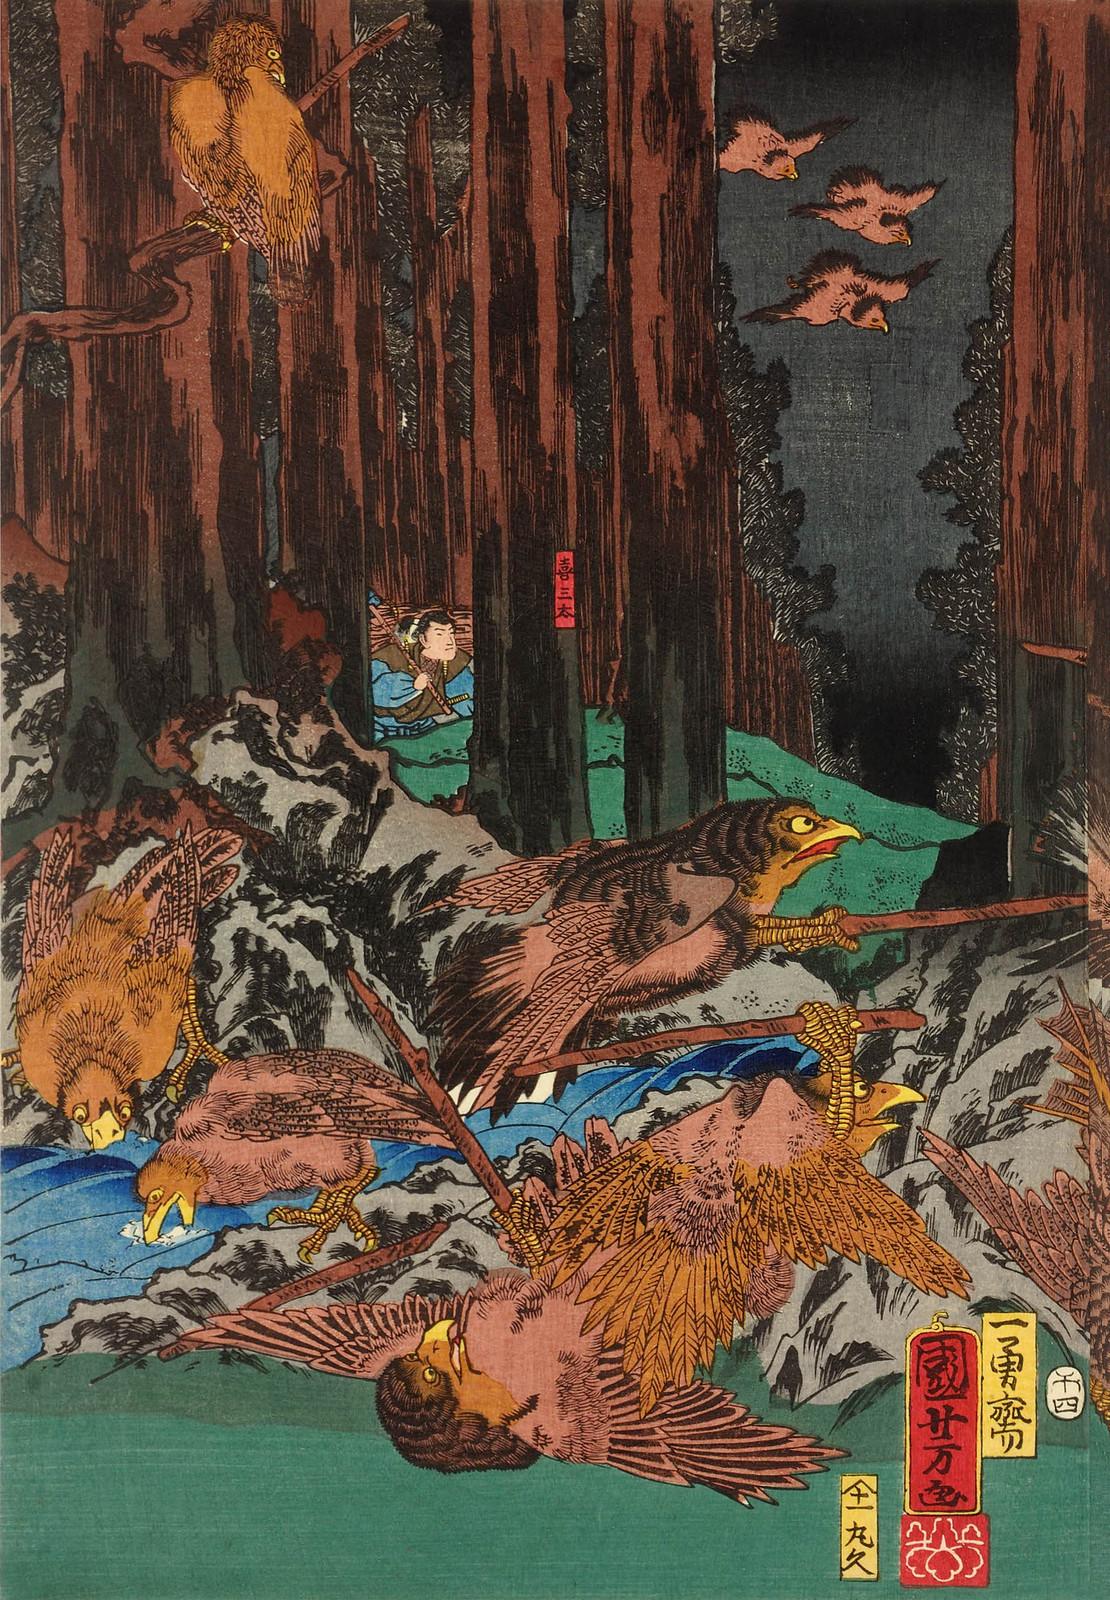 Utagawa Kuniyoshi - Ushiwaka Kurama shugyo zu, 1858 (right panel)